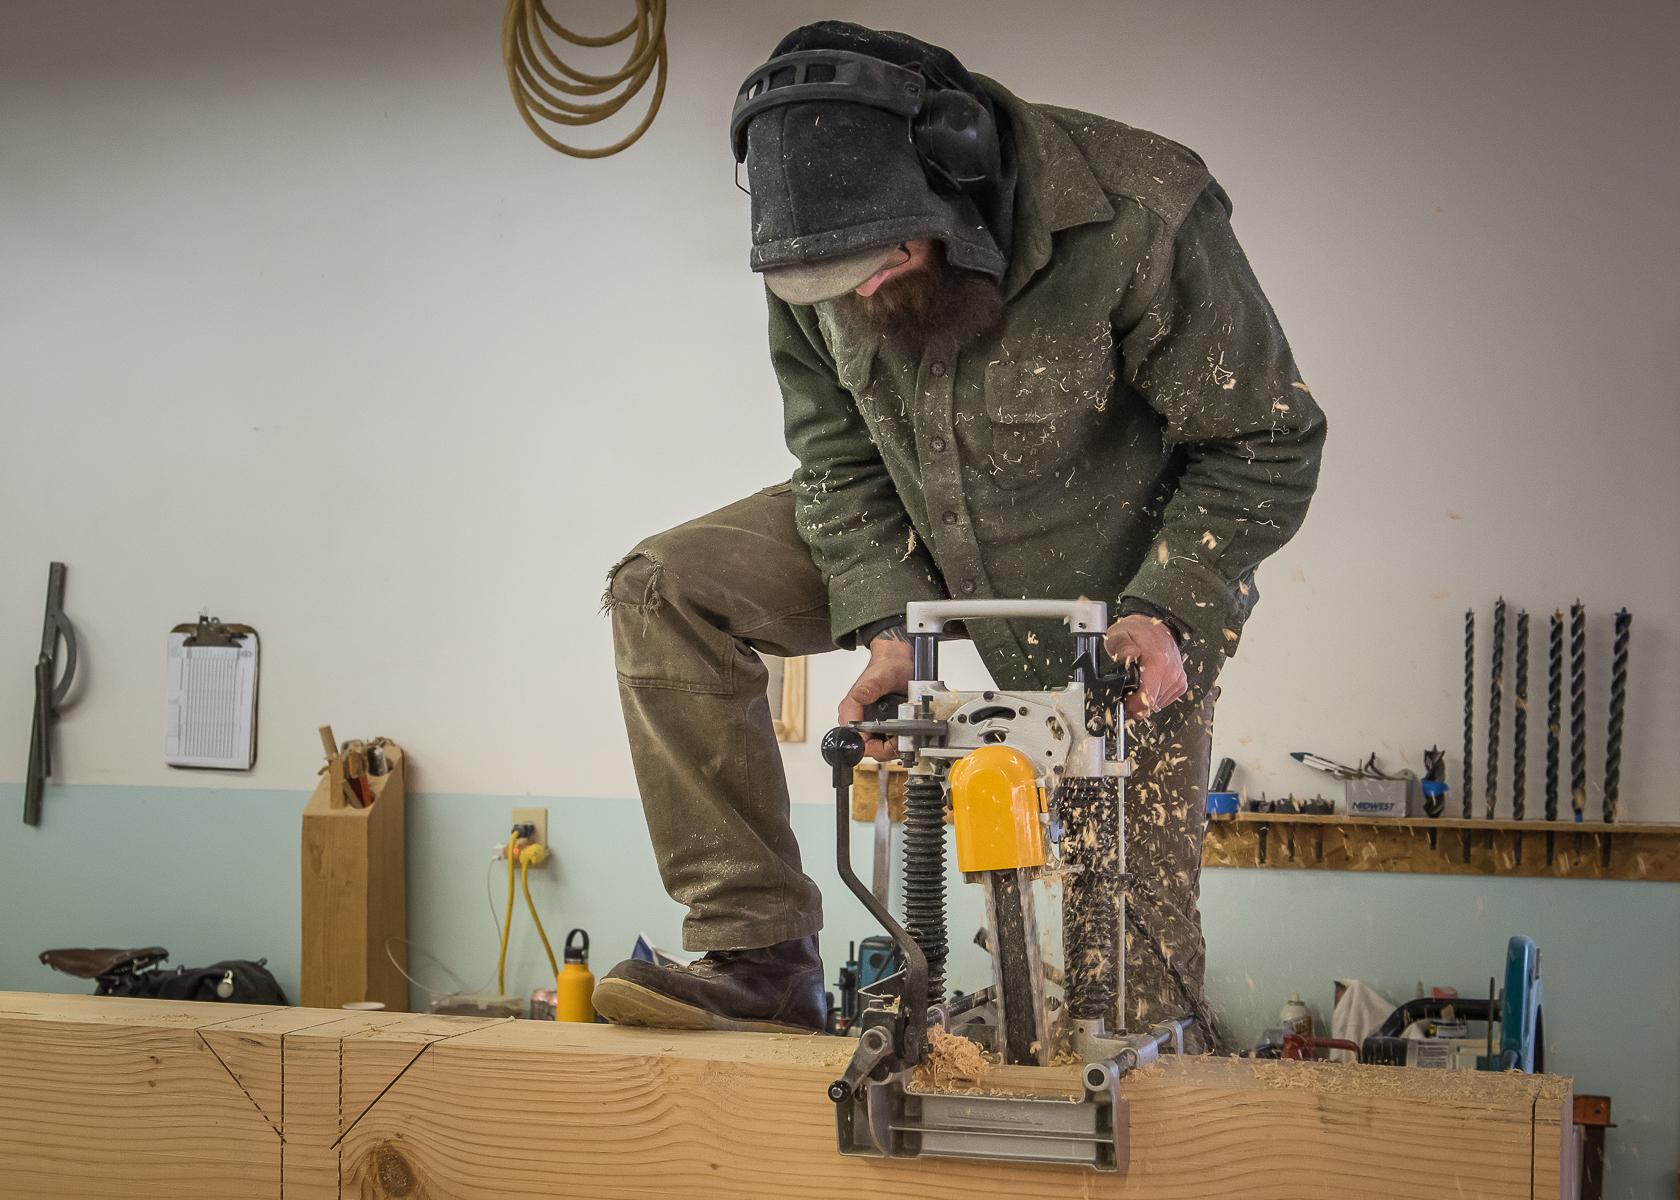 Timber Frame Fabrication Mortiser in work shop